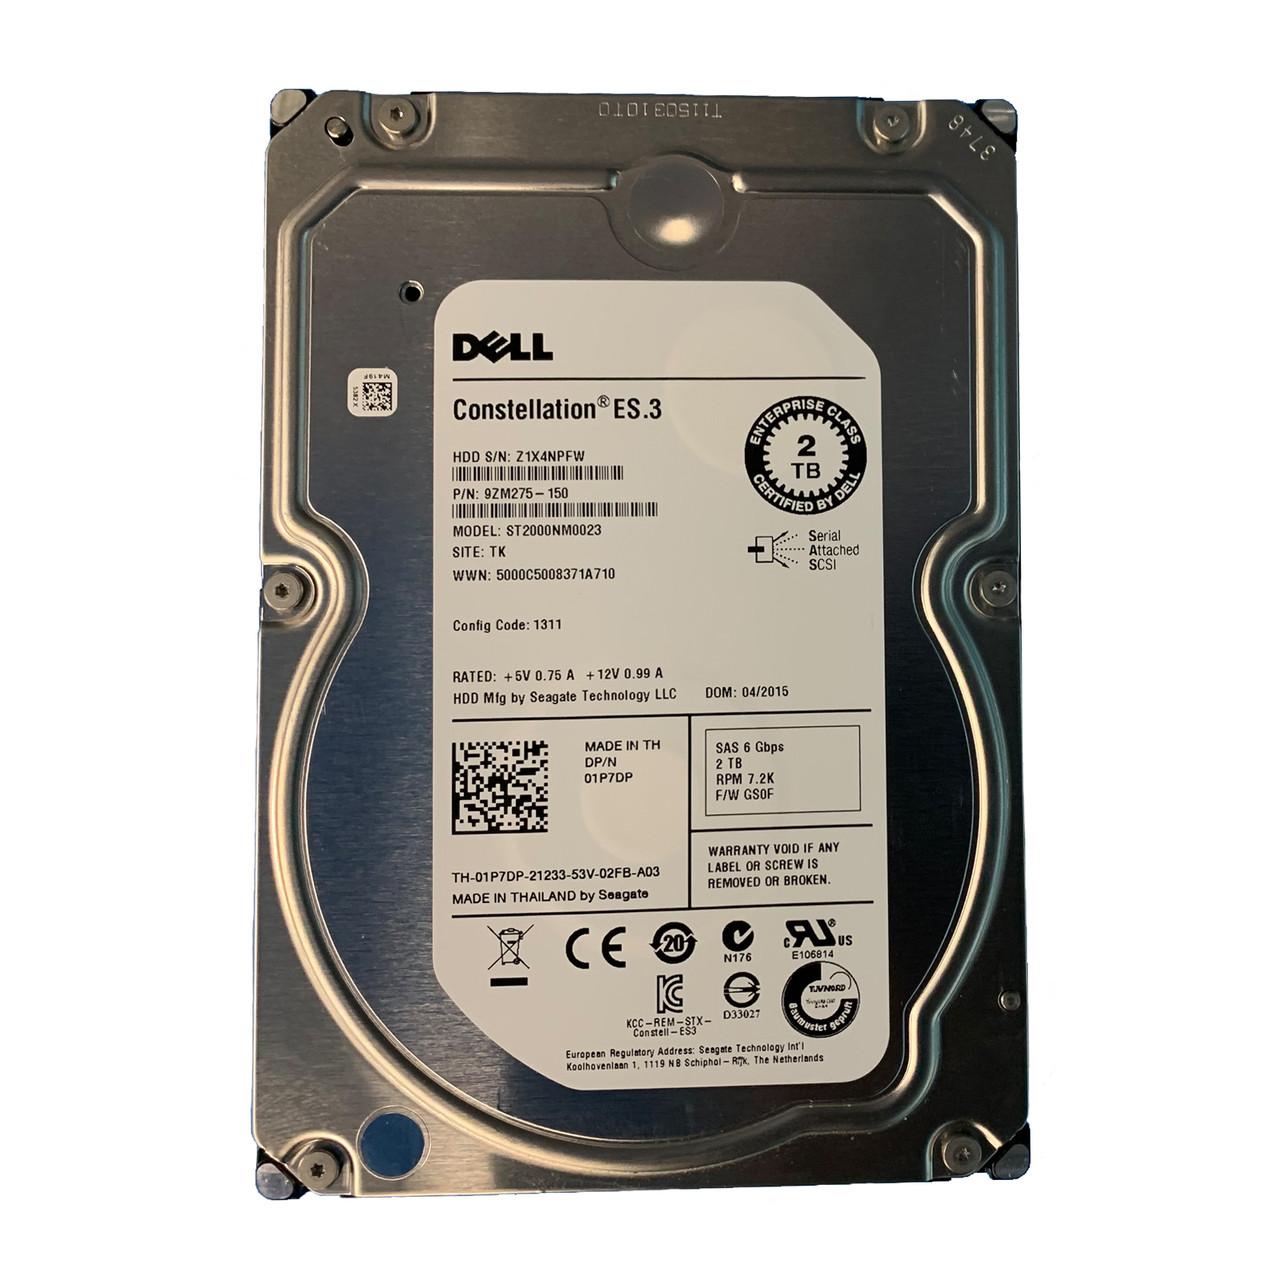 "Dell 1P7DP  Constellation ES.3  2TB 7.2K 3.5/"" SAS  Hard Drive ST2000NM0023"